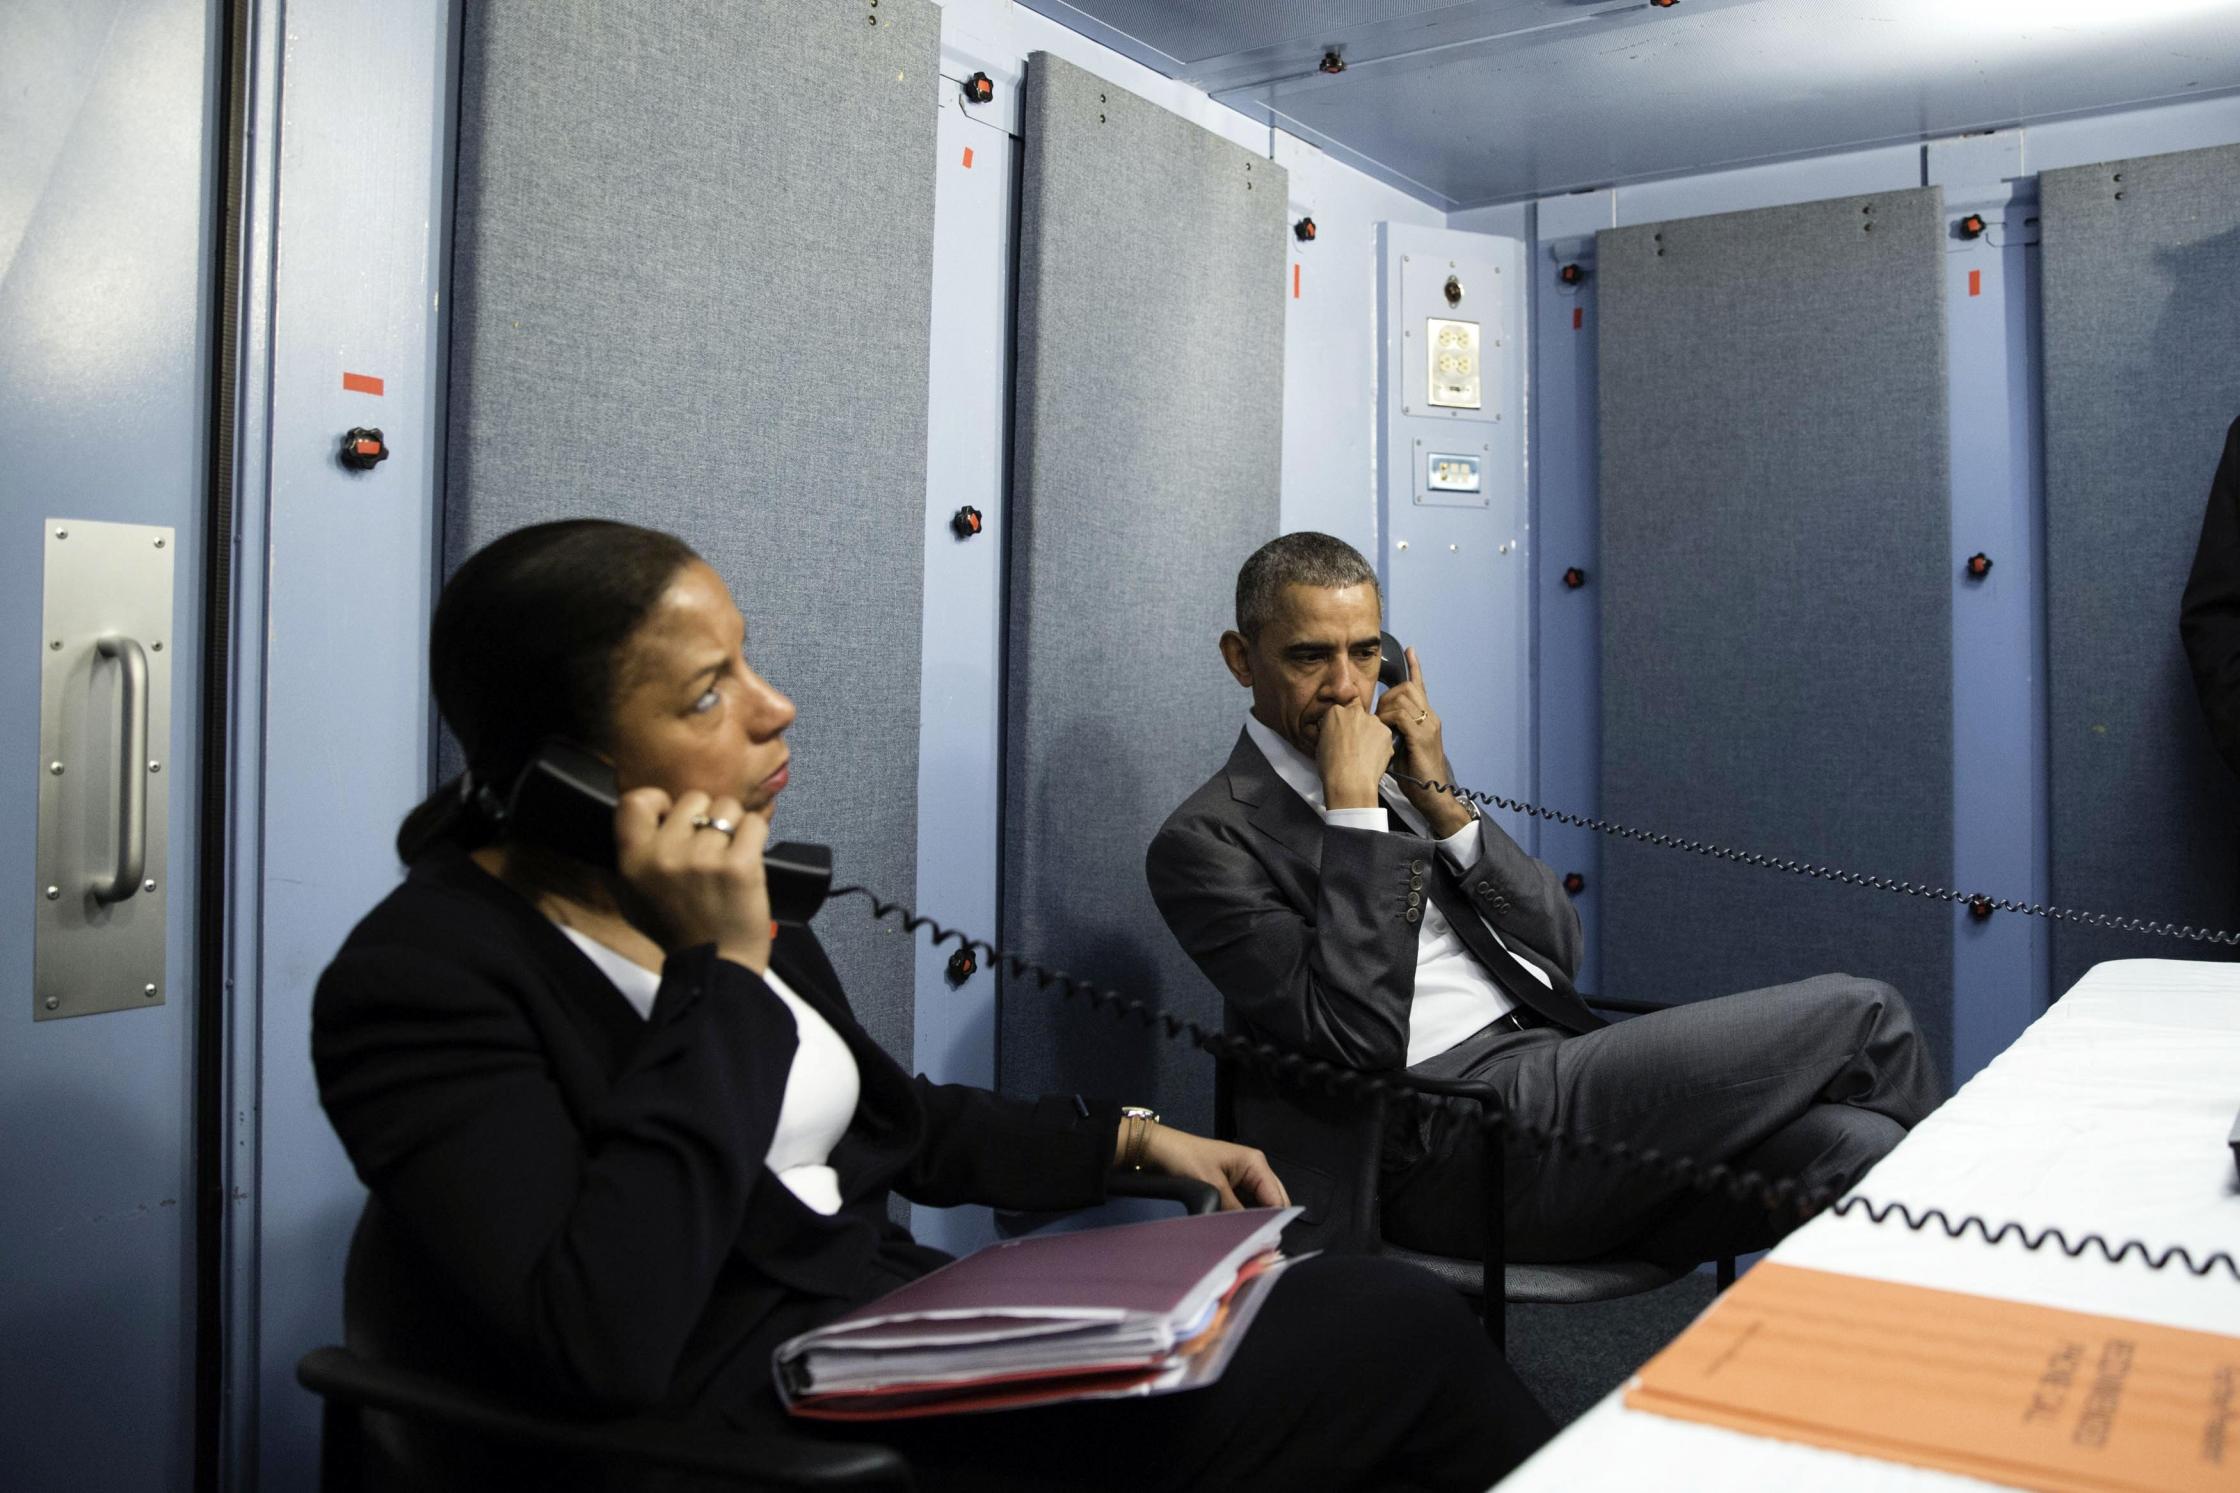 File photo of US President Barack Obama and national security adviser Susan Rice. Credit: Wikimedia